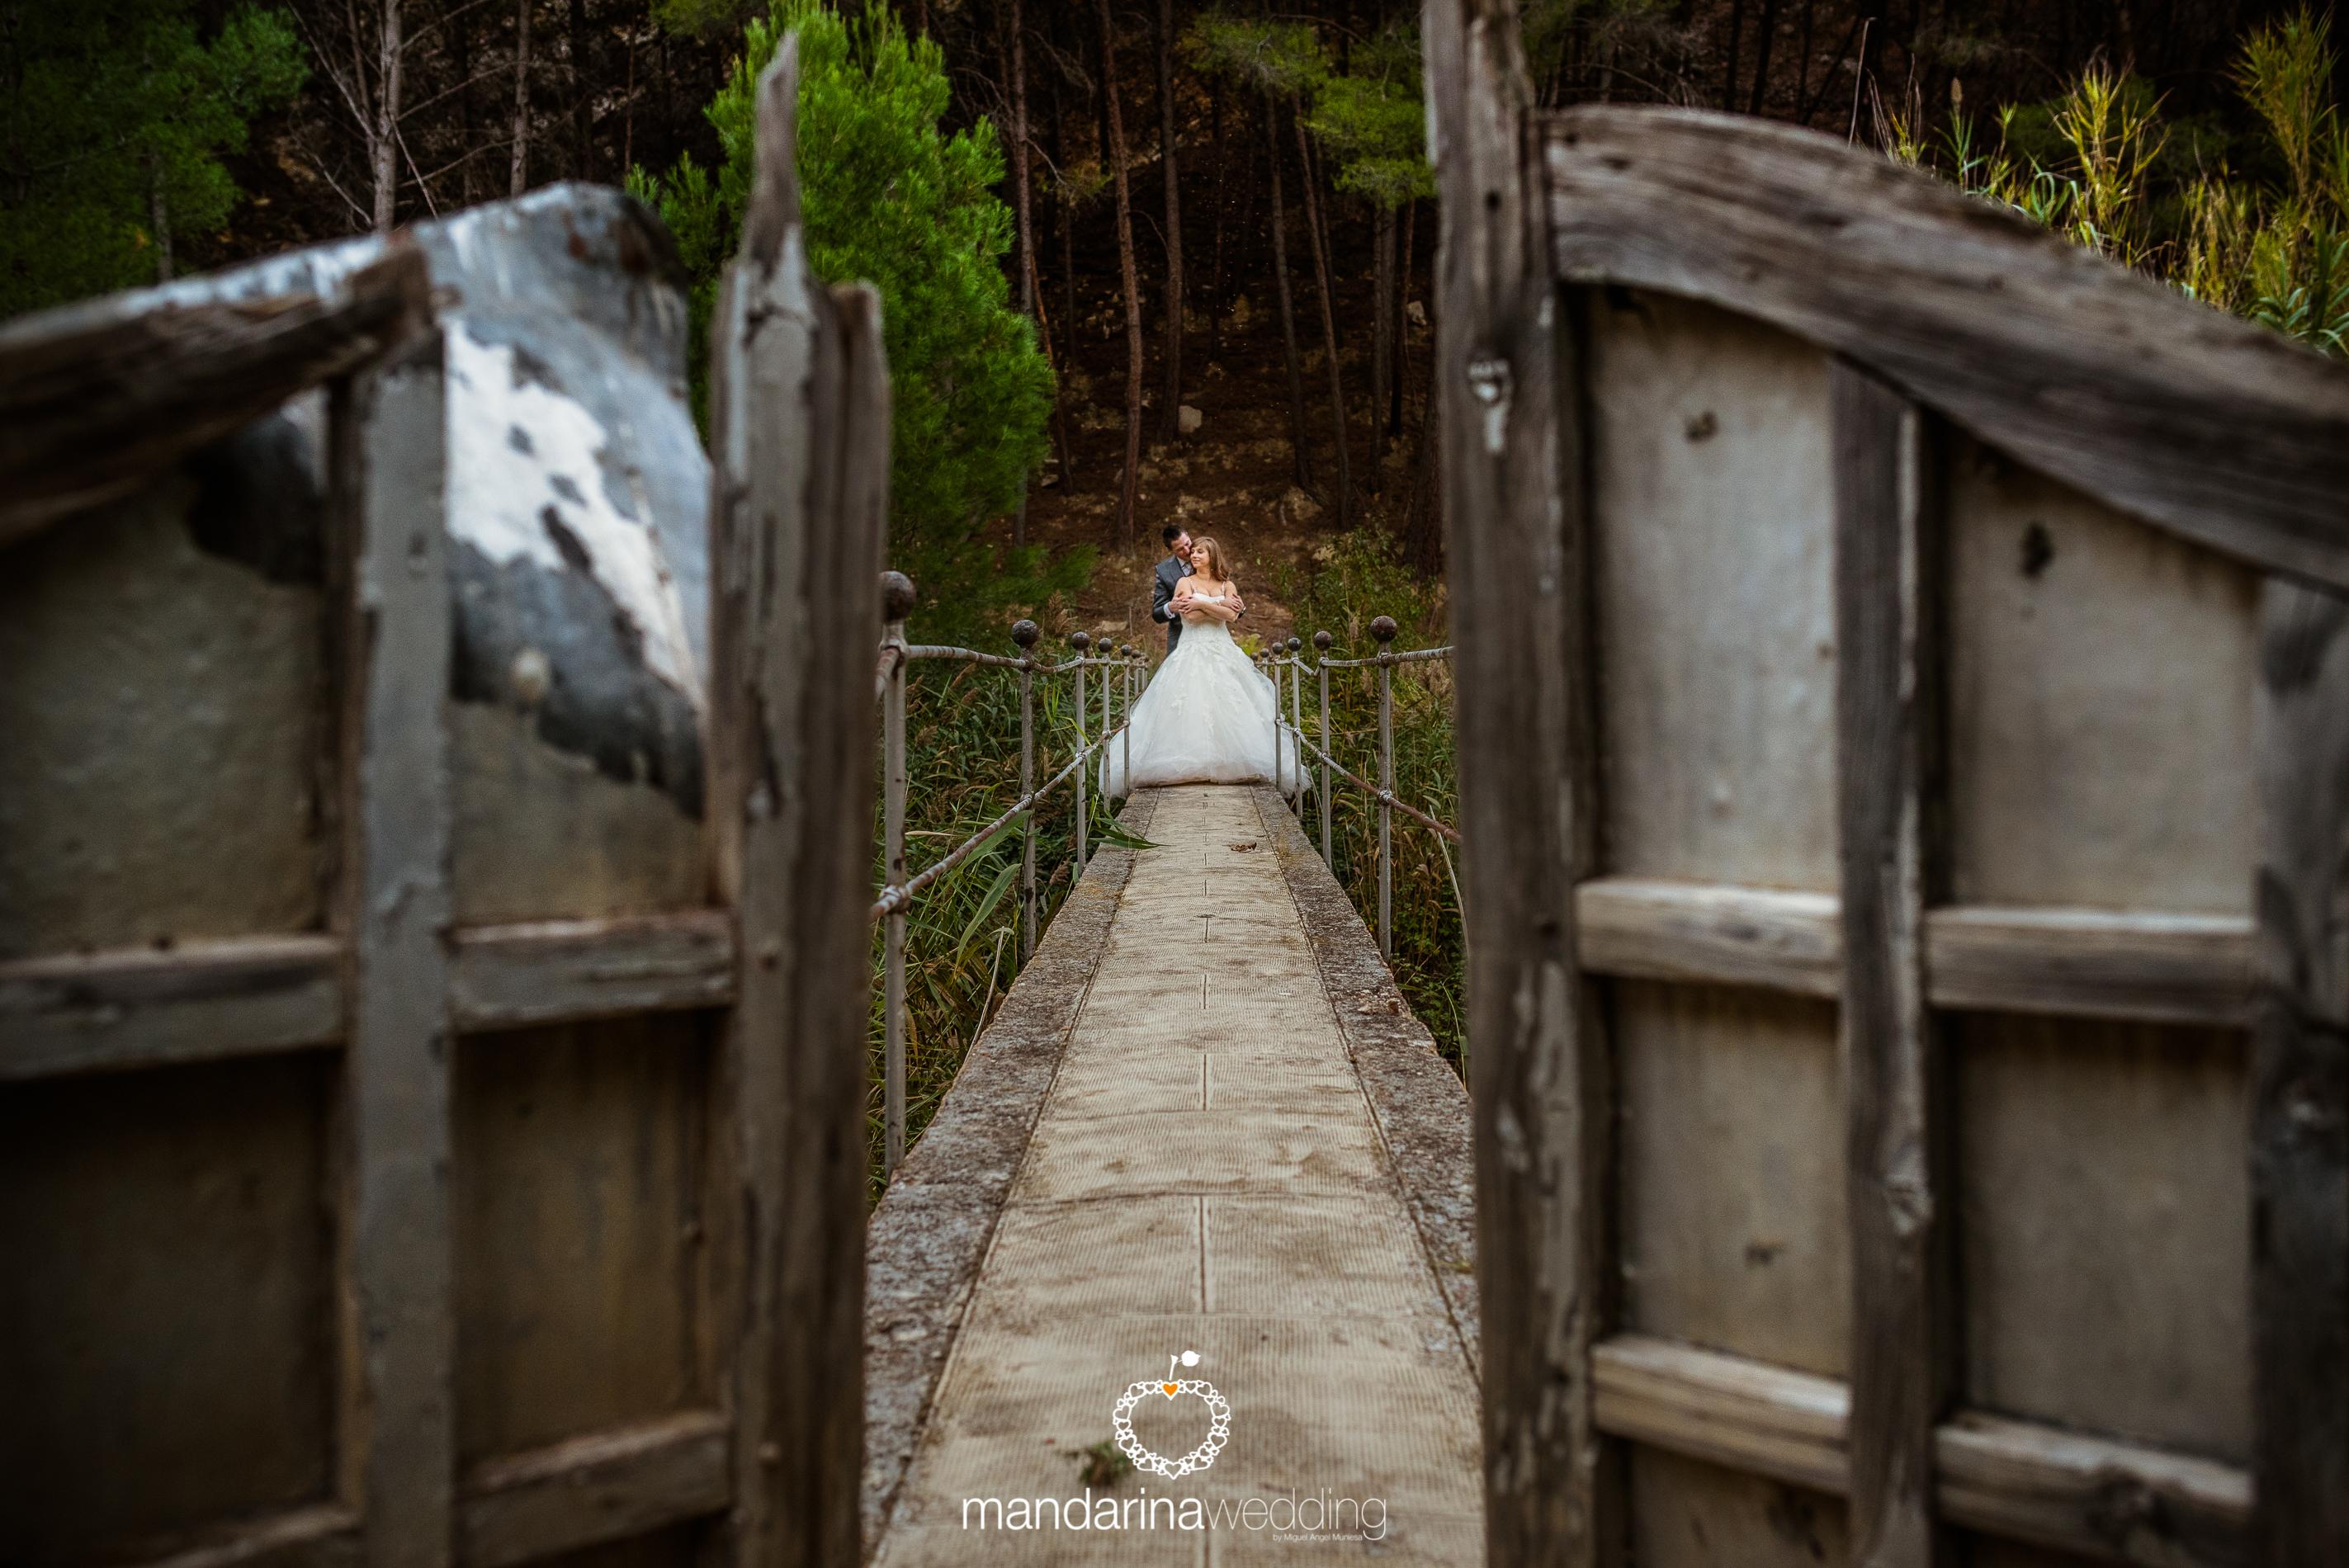 mandarina wedding, fotogarfos boda zaragoza, postboda, postboda en oliete, fotografos boda teruel, fotografos huesca_04